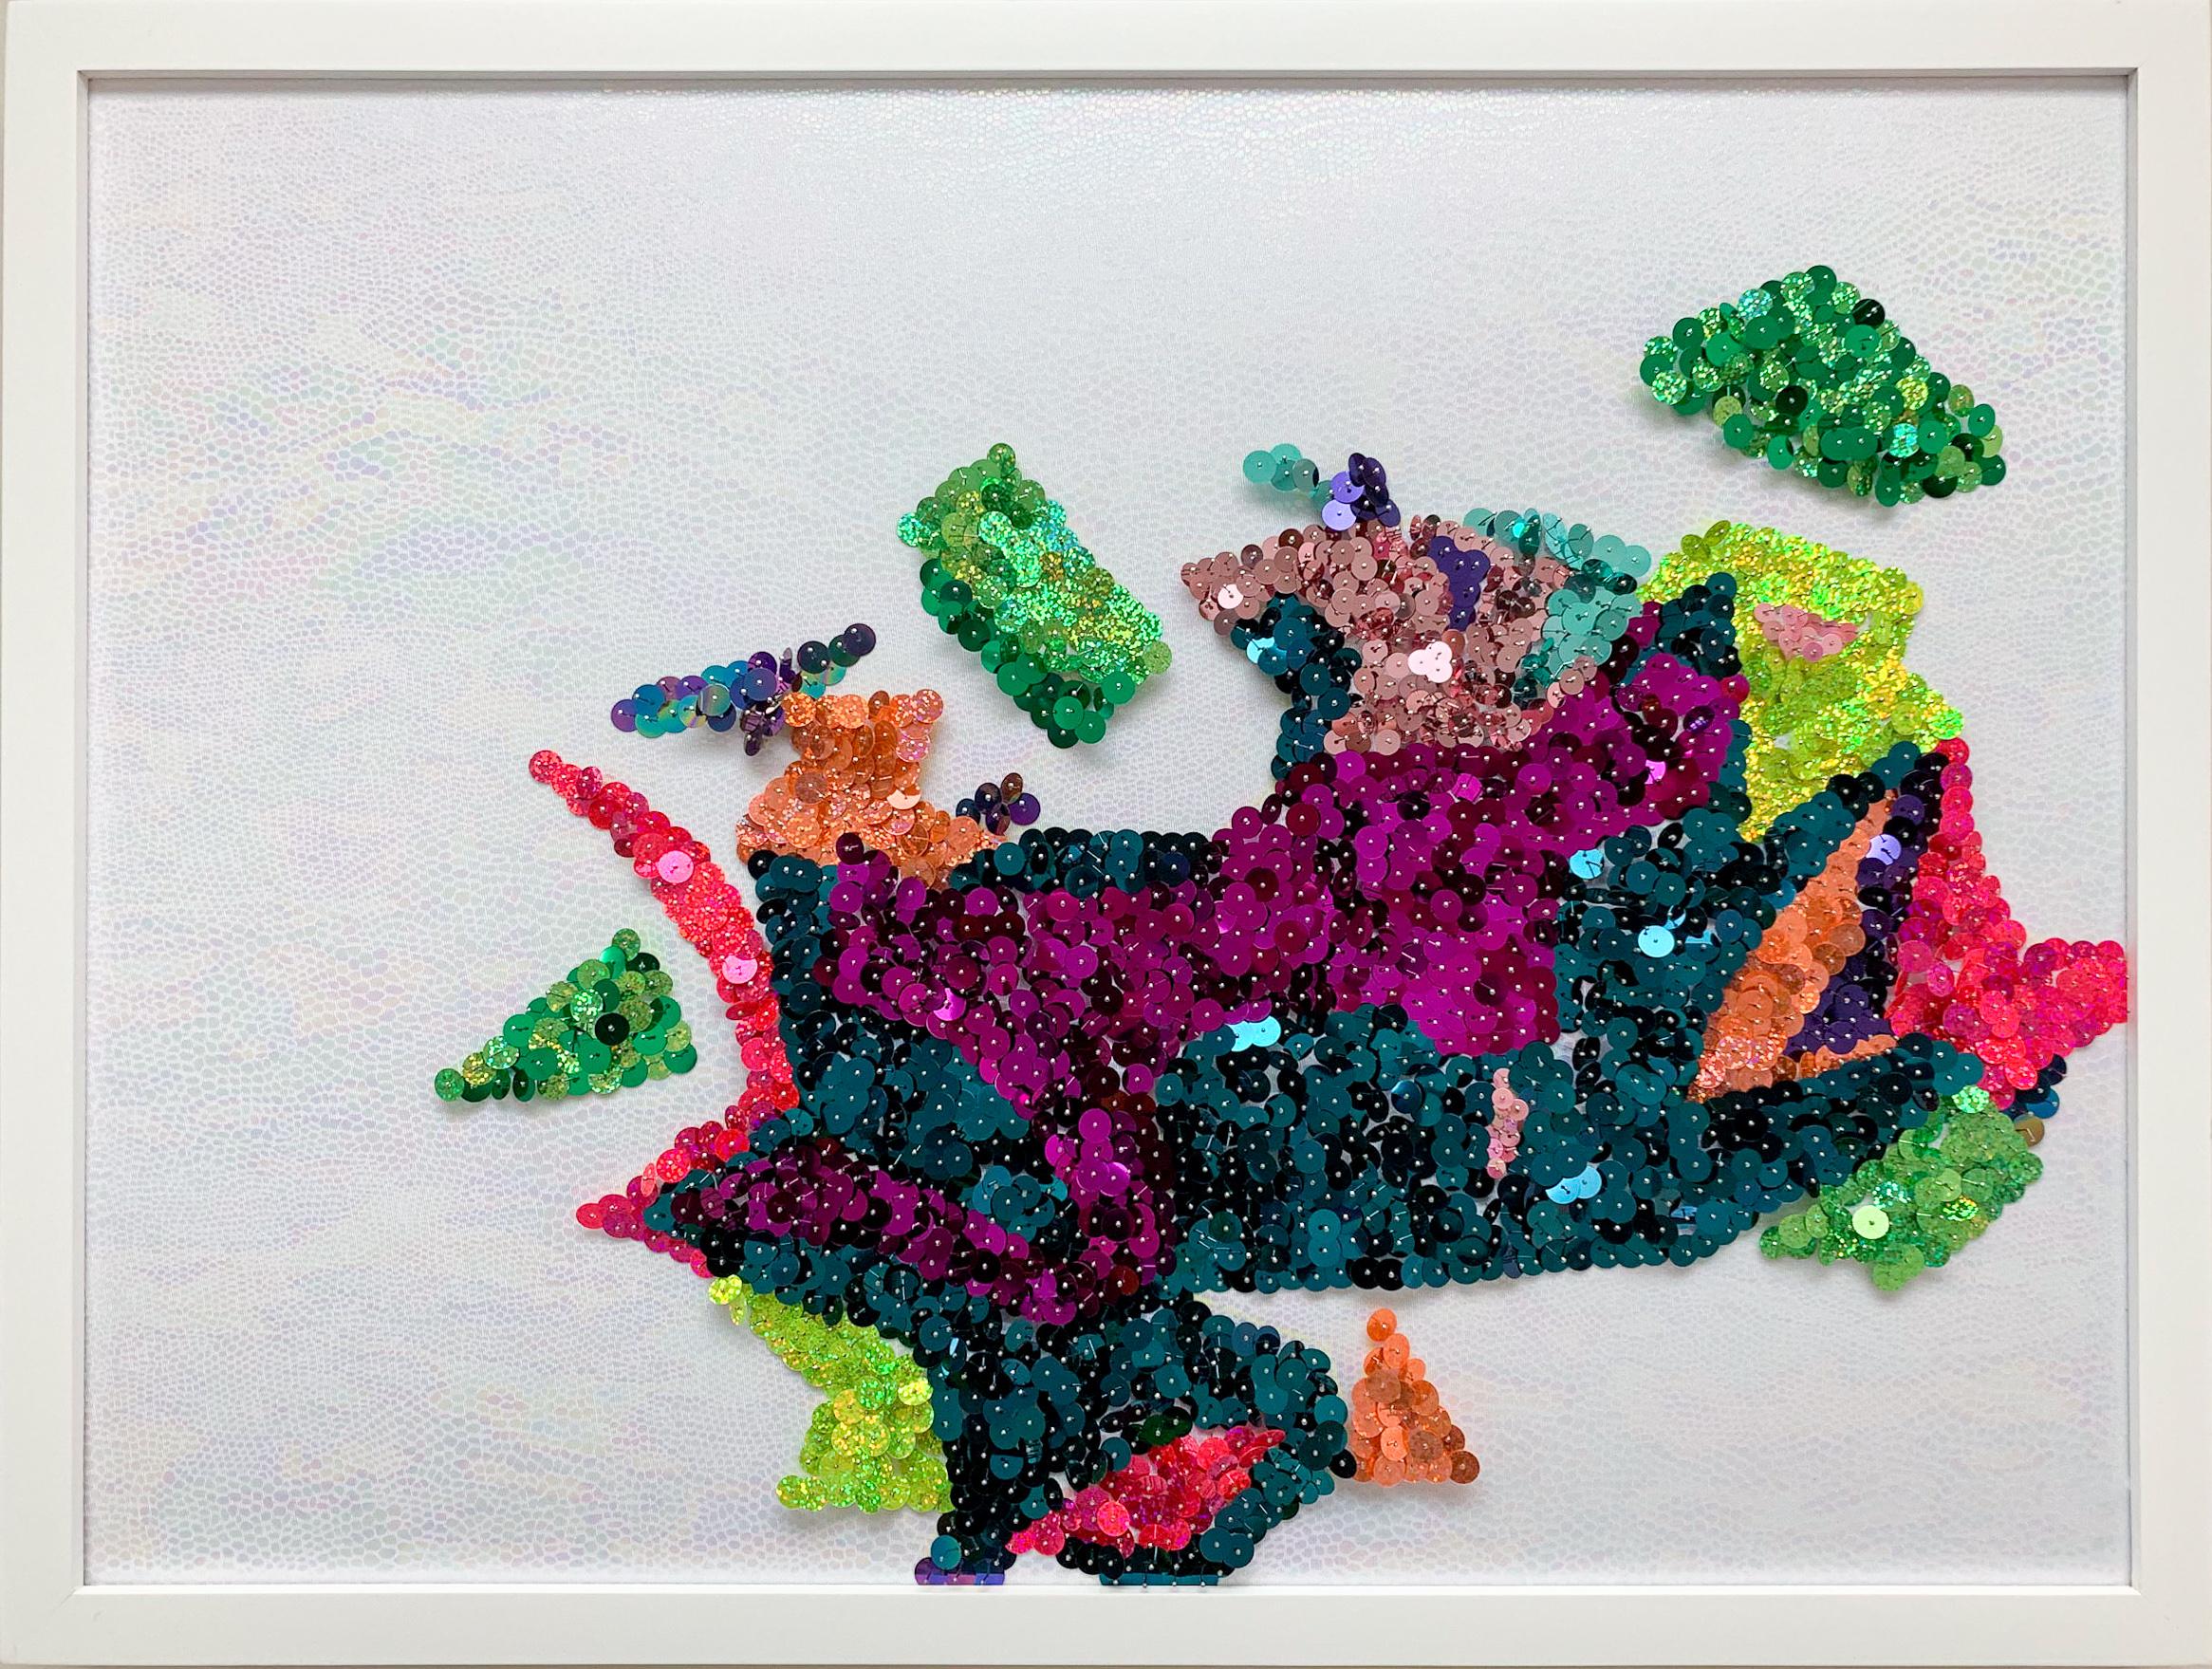 Fragmented Flowers (glimmer) 5